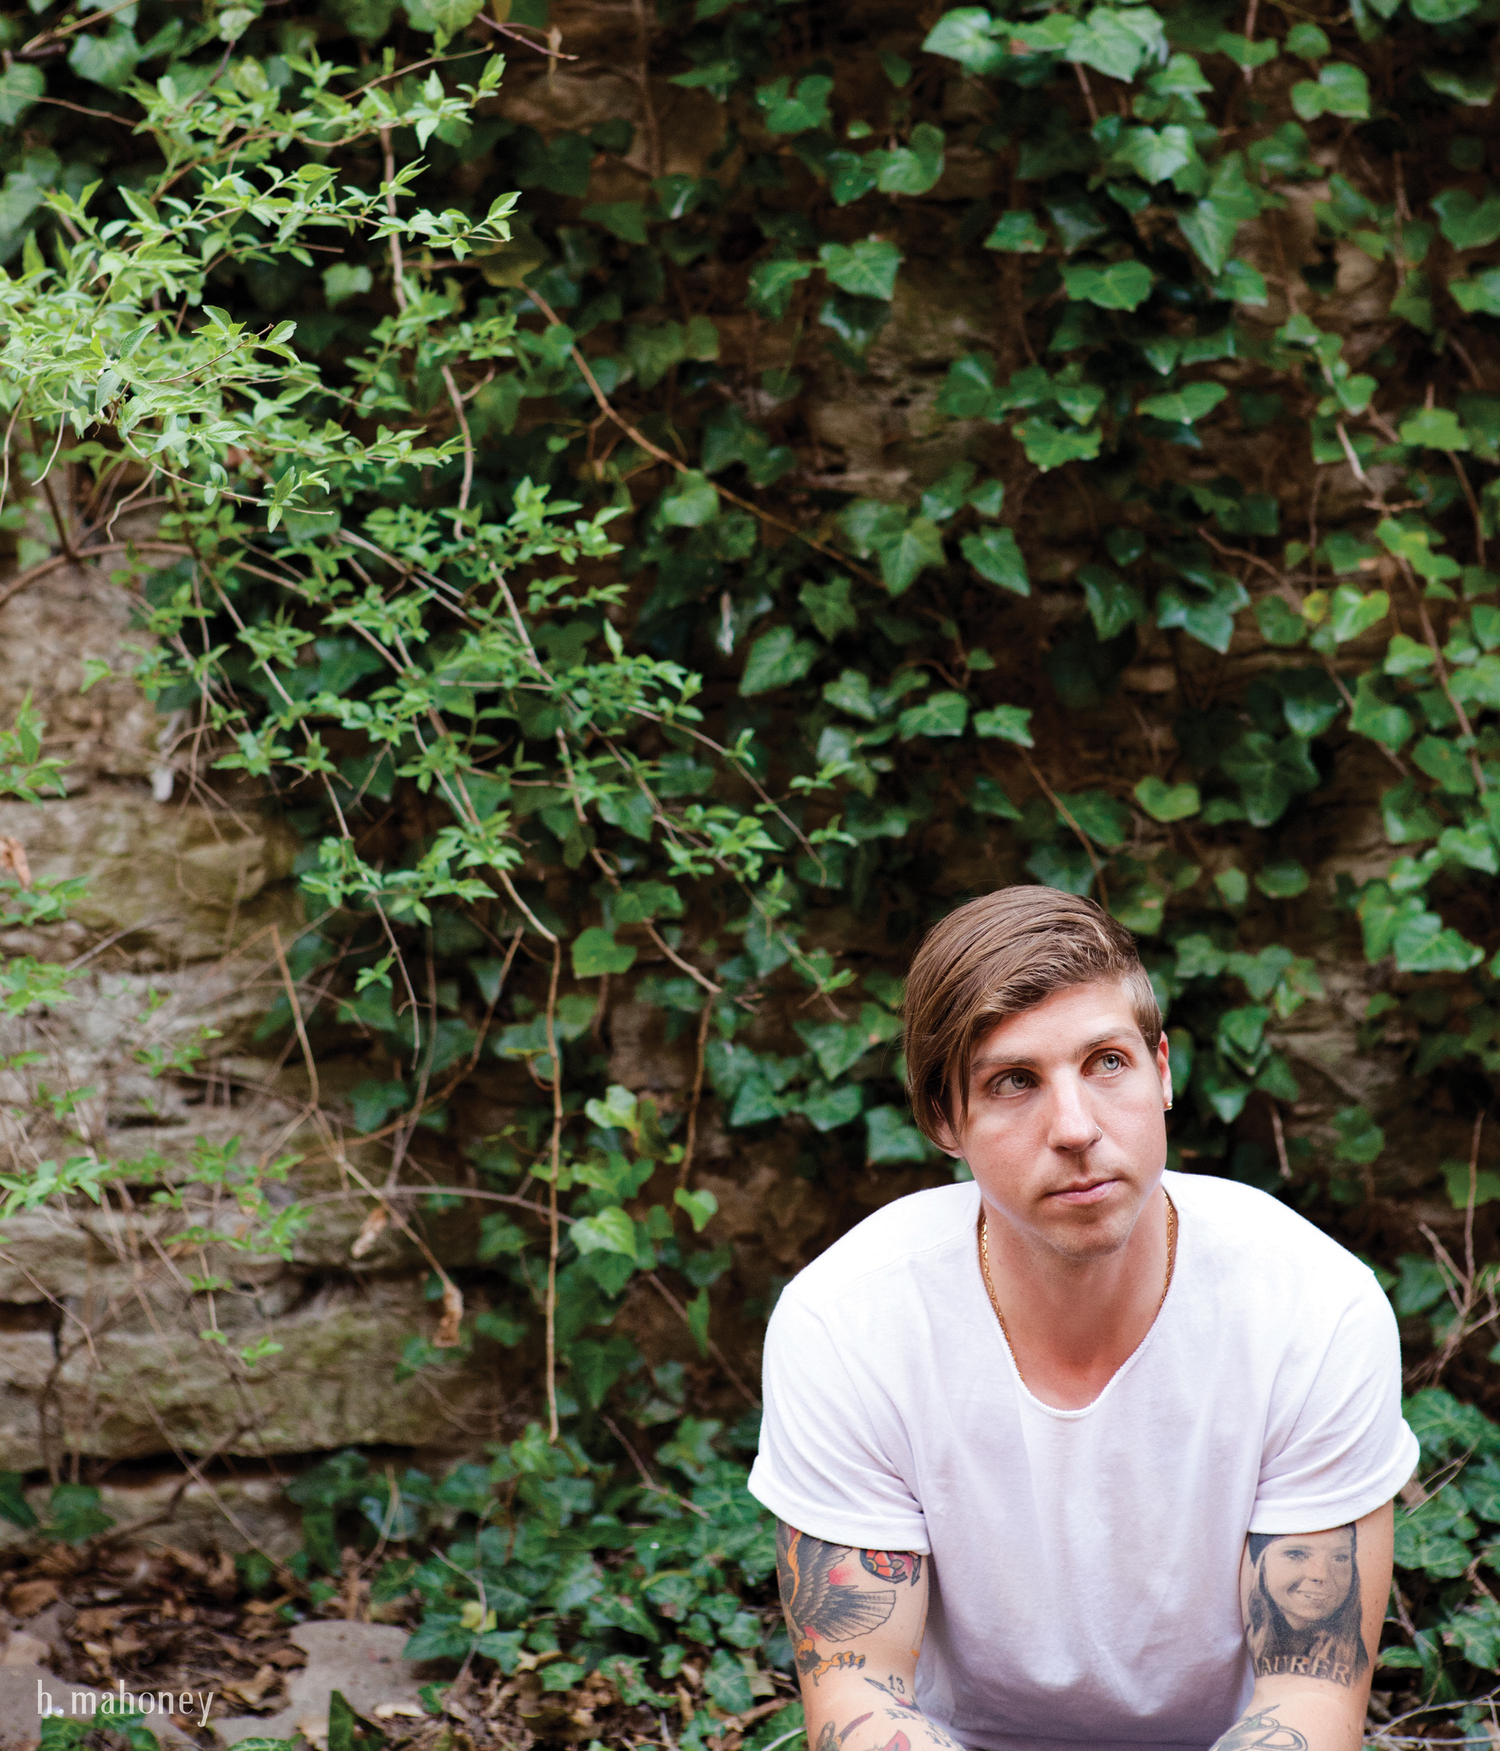 Alex Broskow - Kansas City, MO